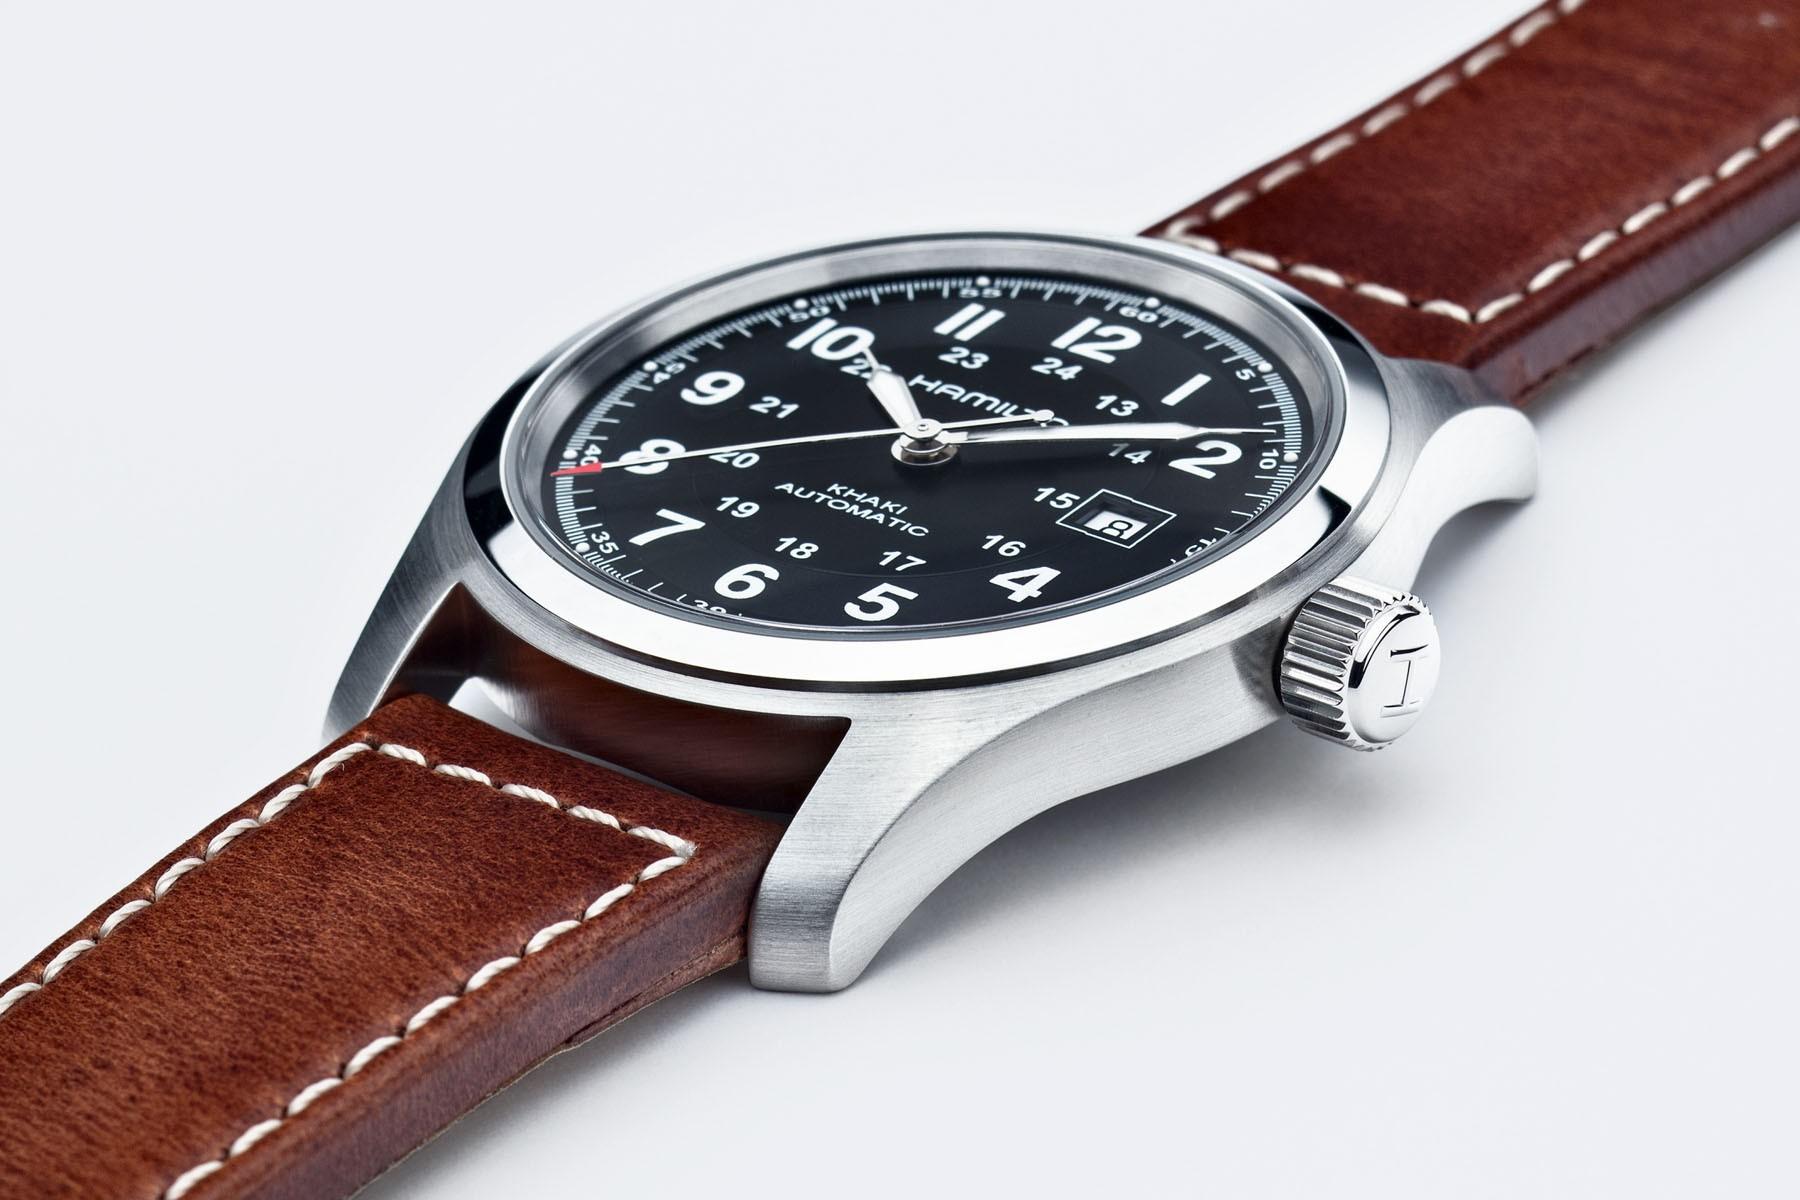 The New Hamilton Khaki Field Mechanical Watch Watchbandit